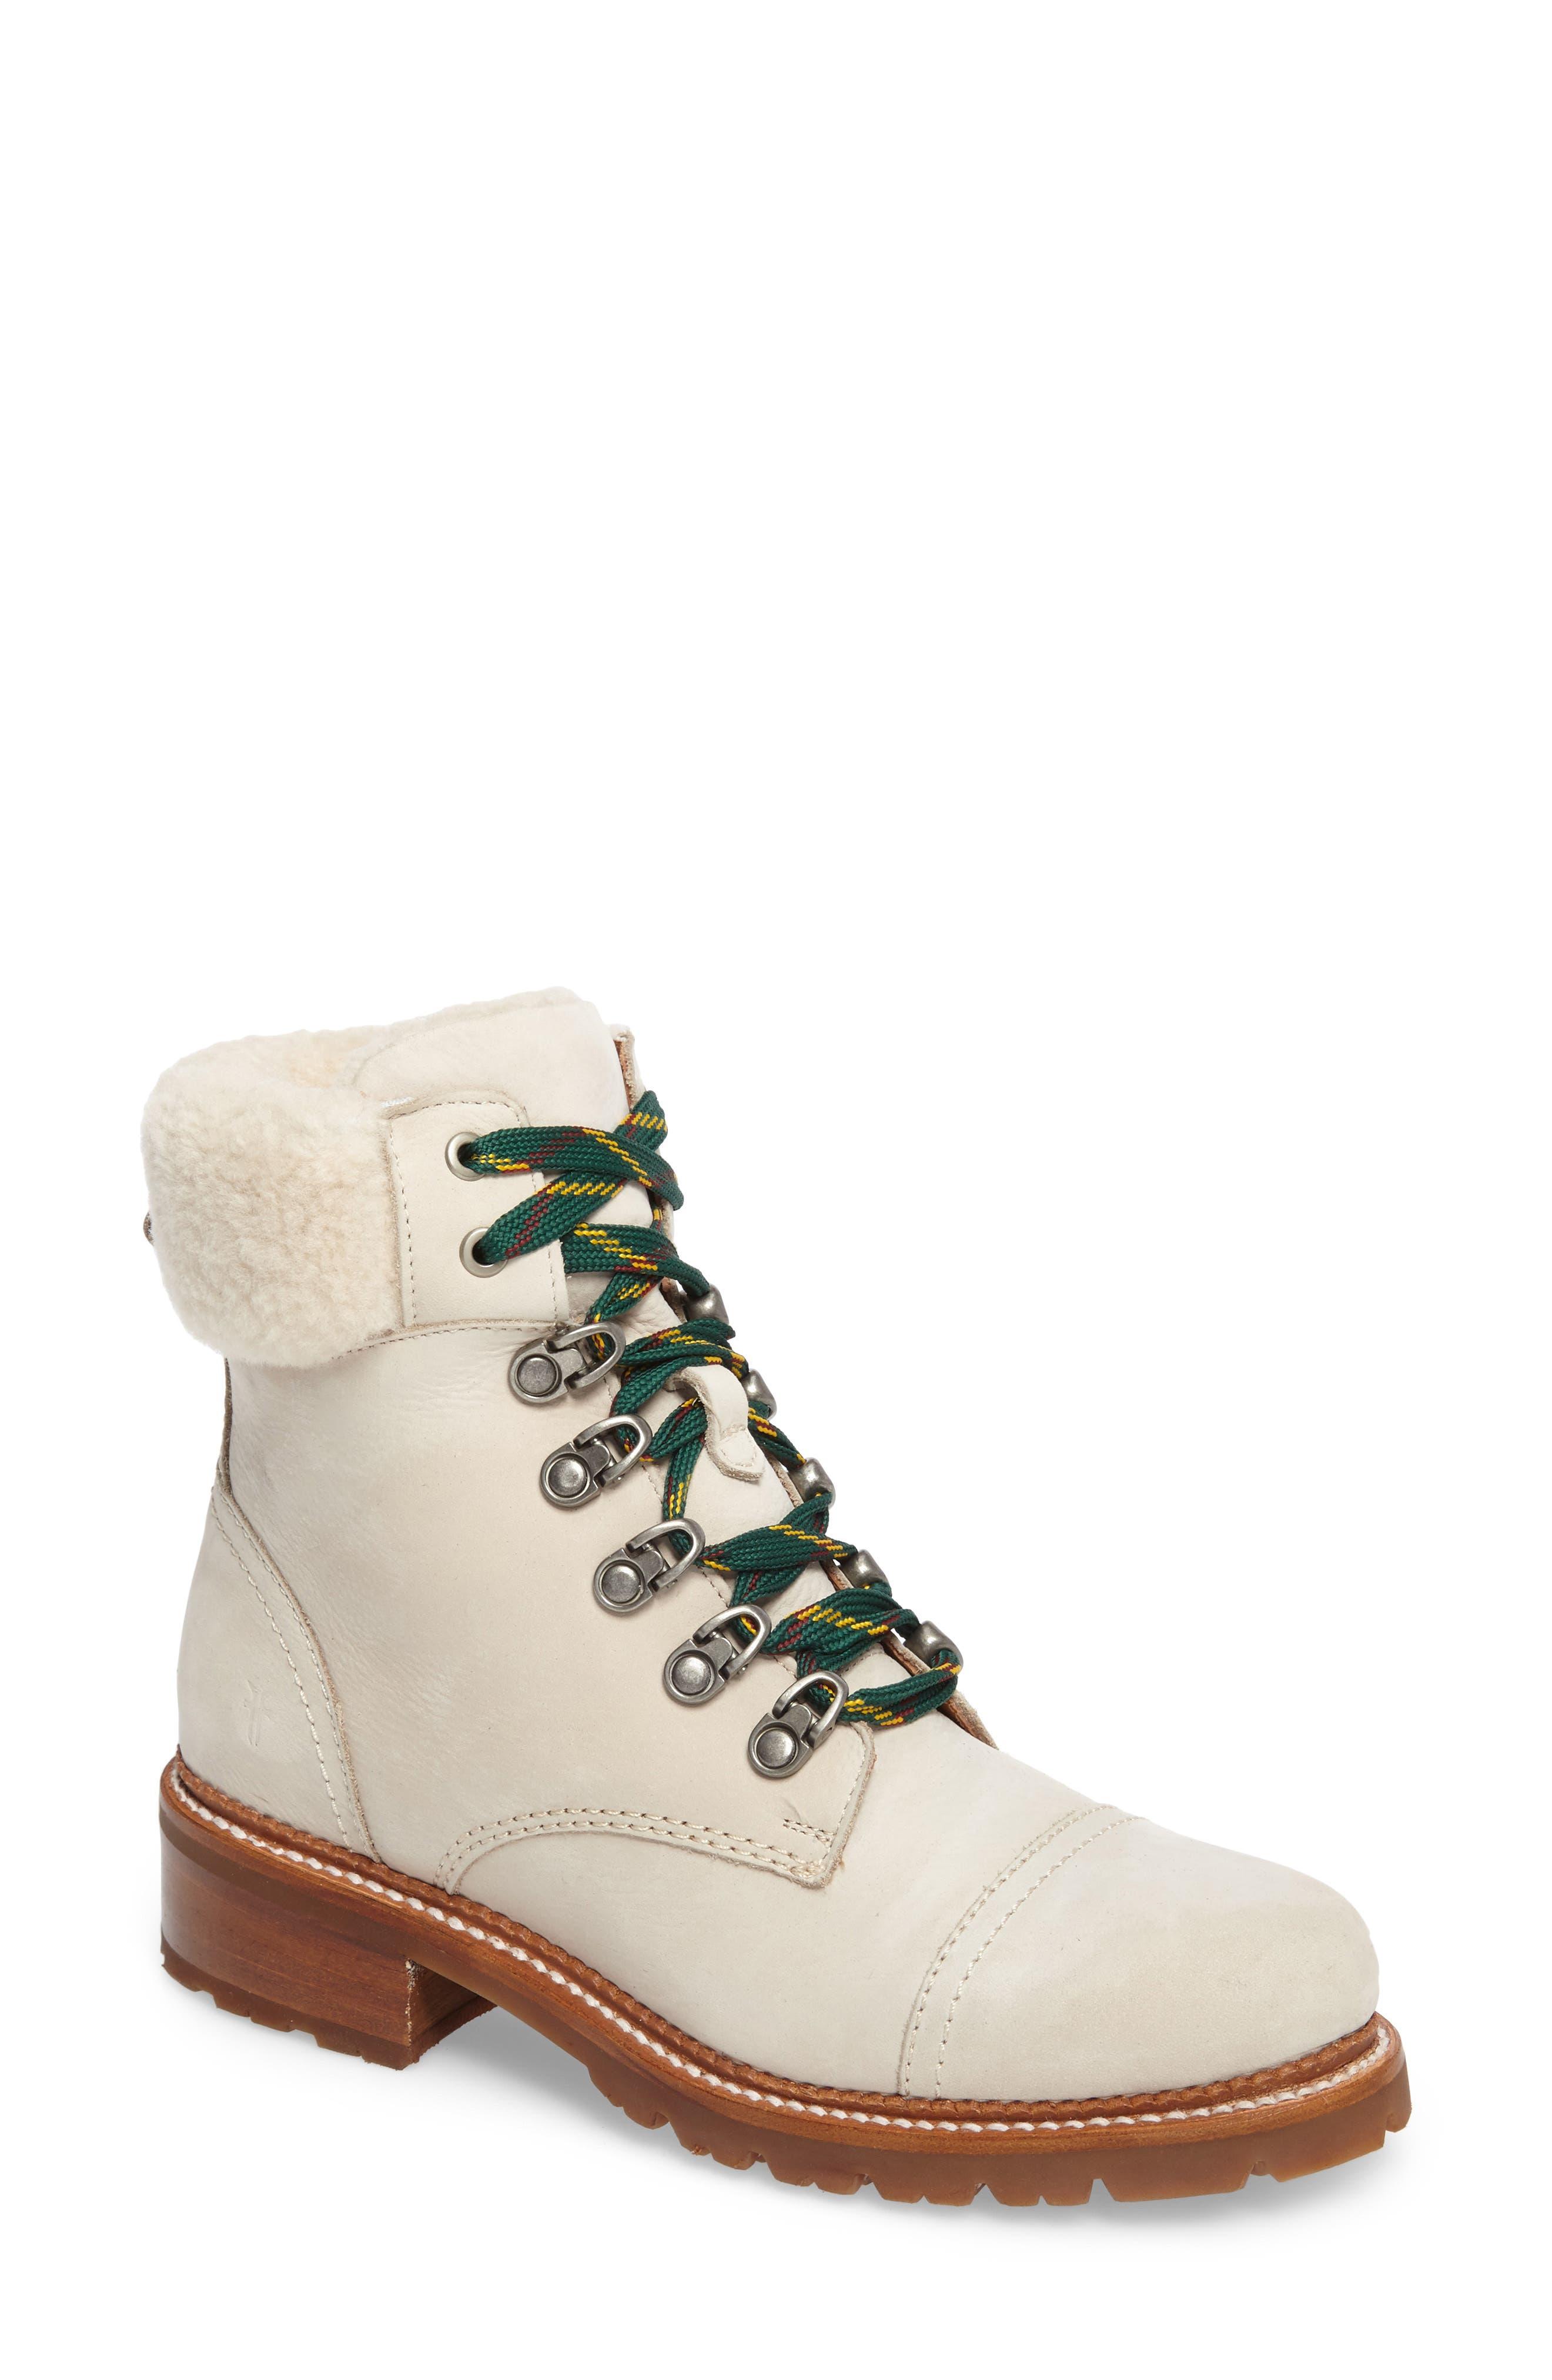 Frye Samantha Water Resistant Hiking Boot, White